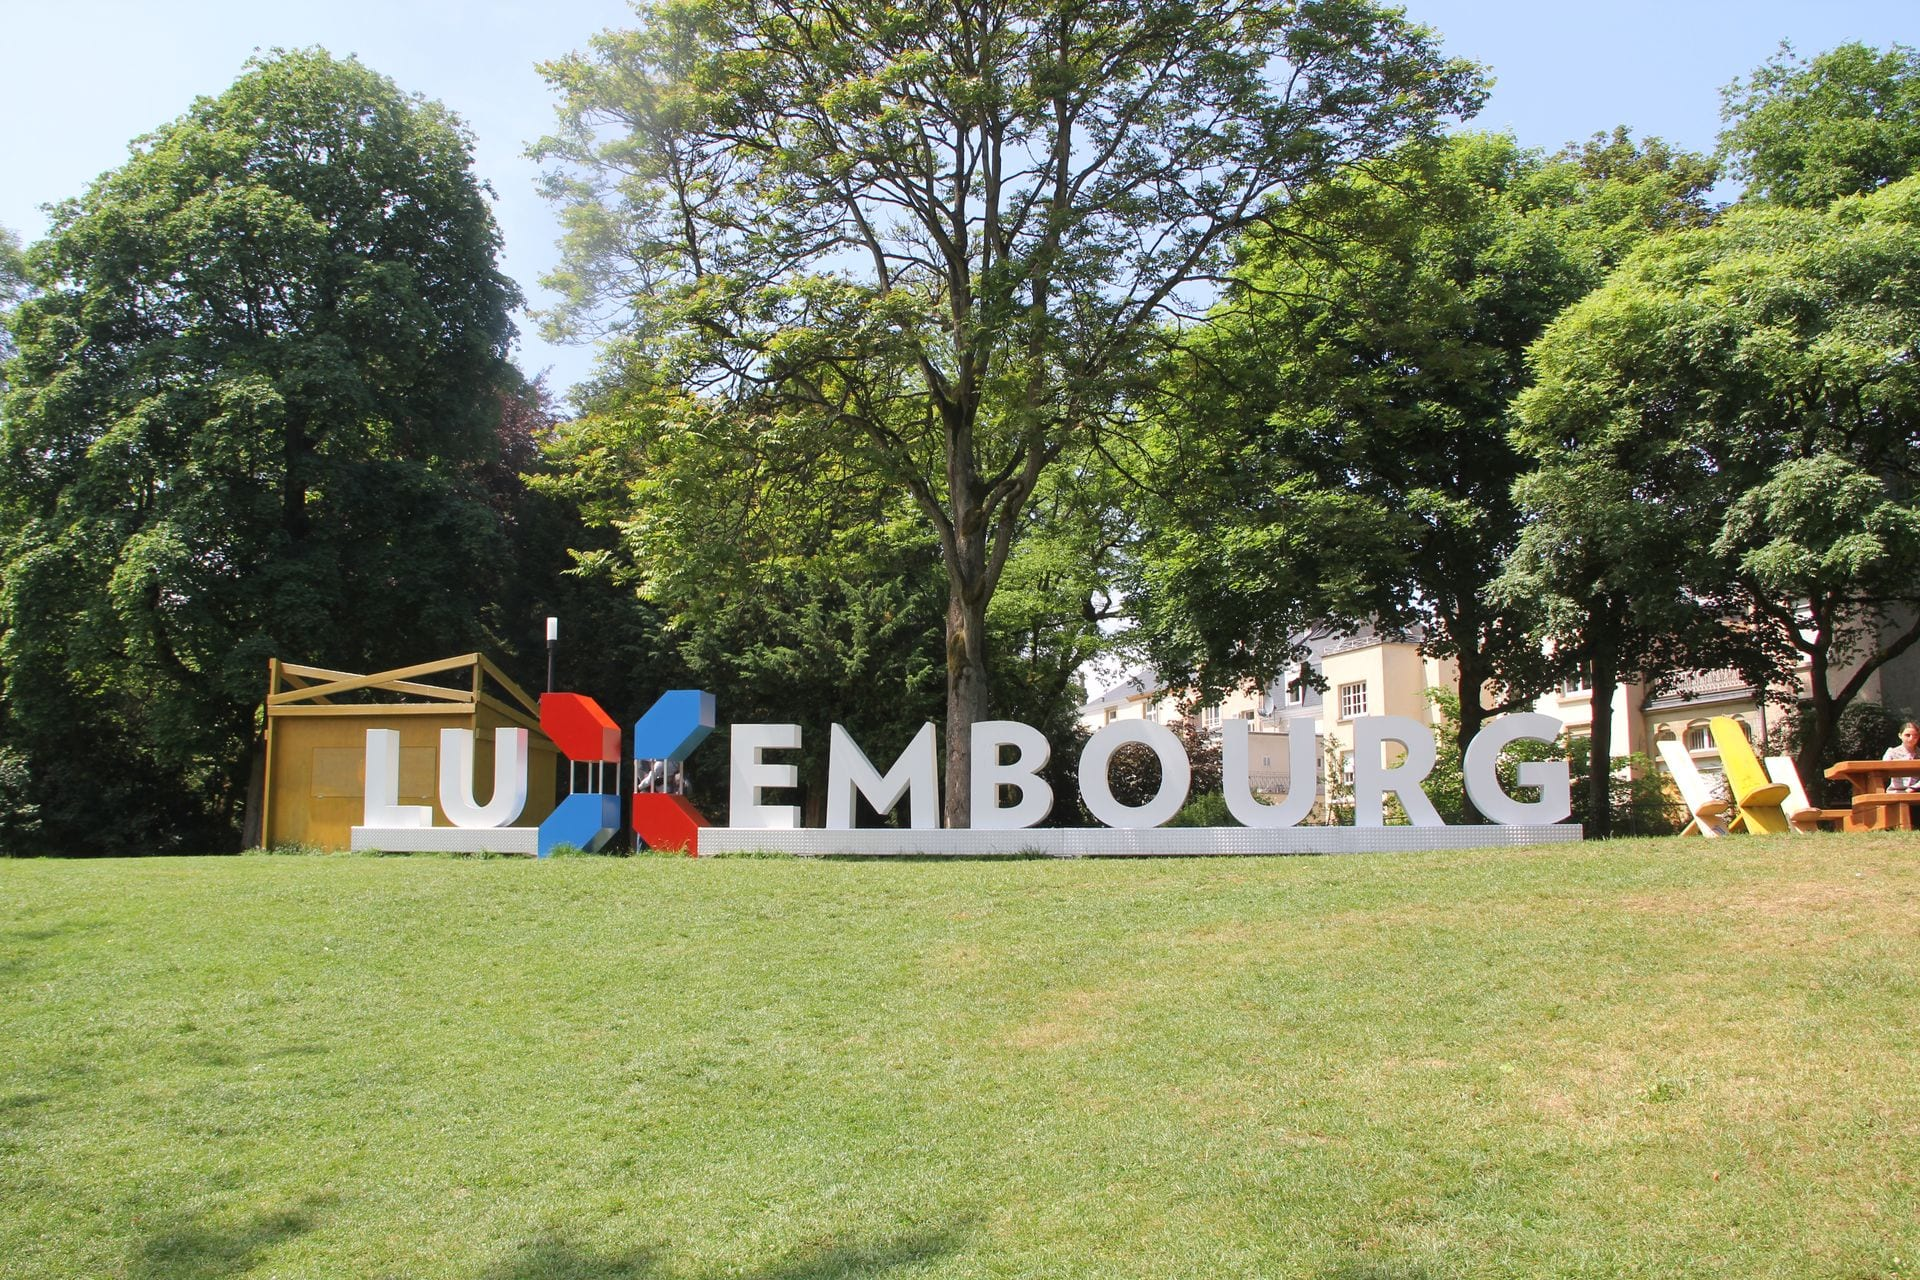 Luxemburg Sign